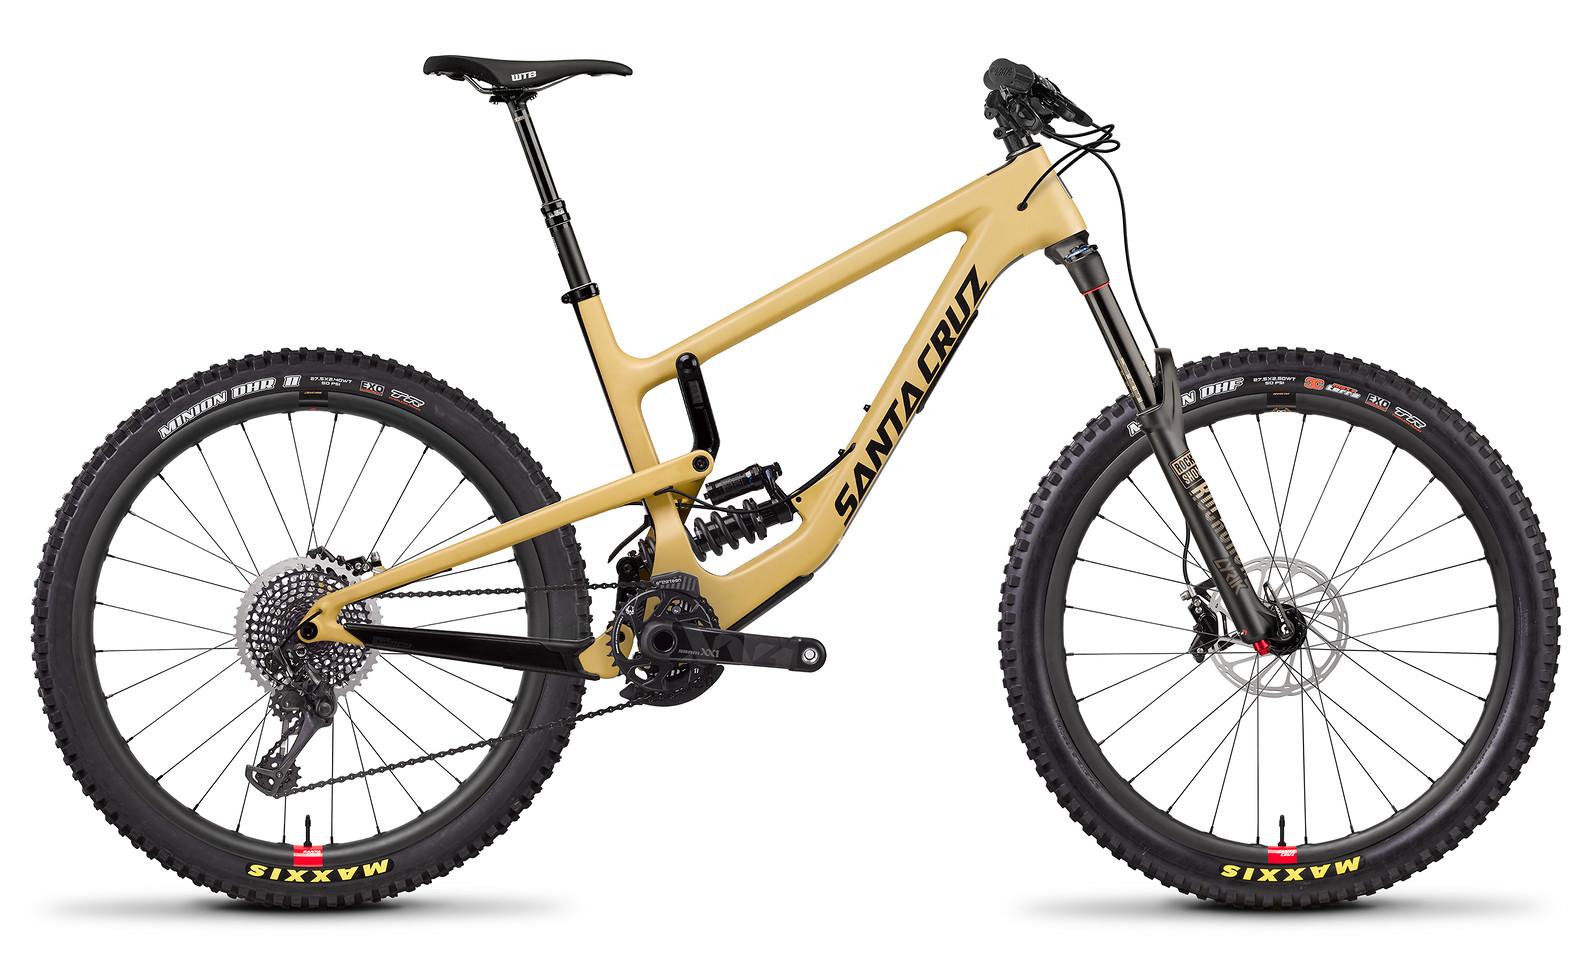 2018 Santa Cruz Nomad XX1 with Reserve Wheels